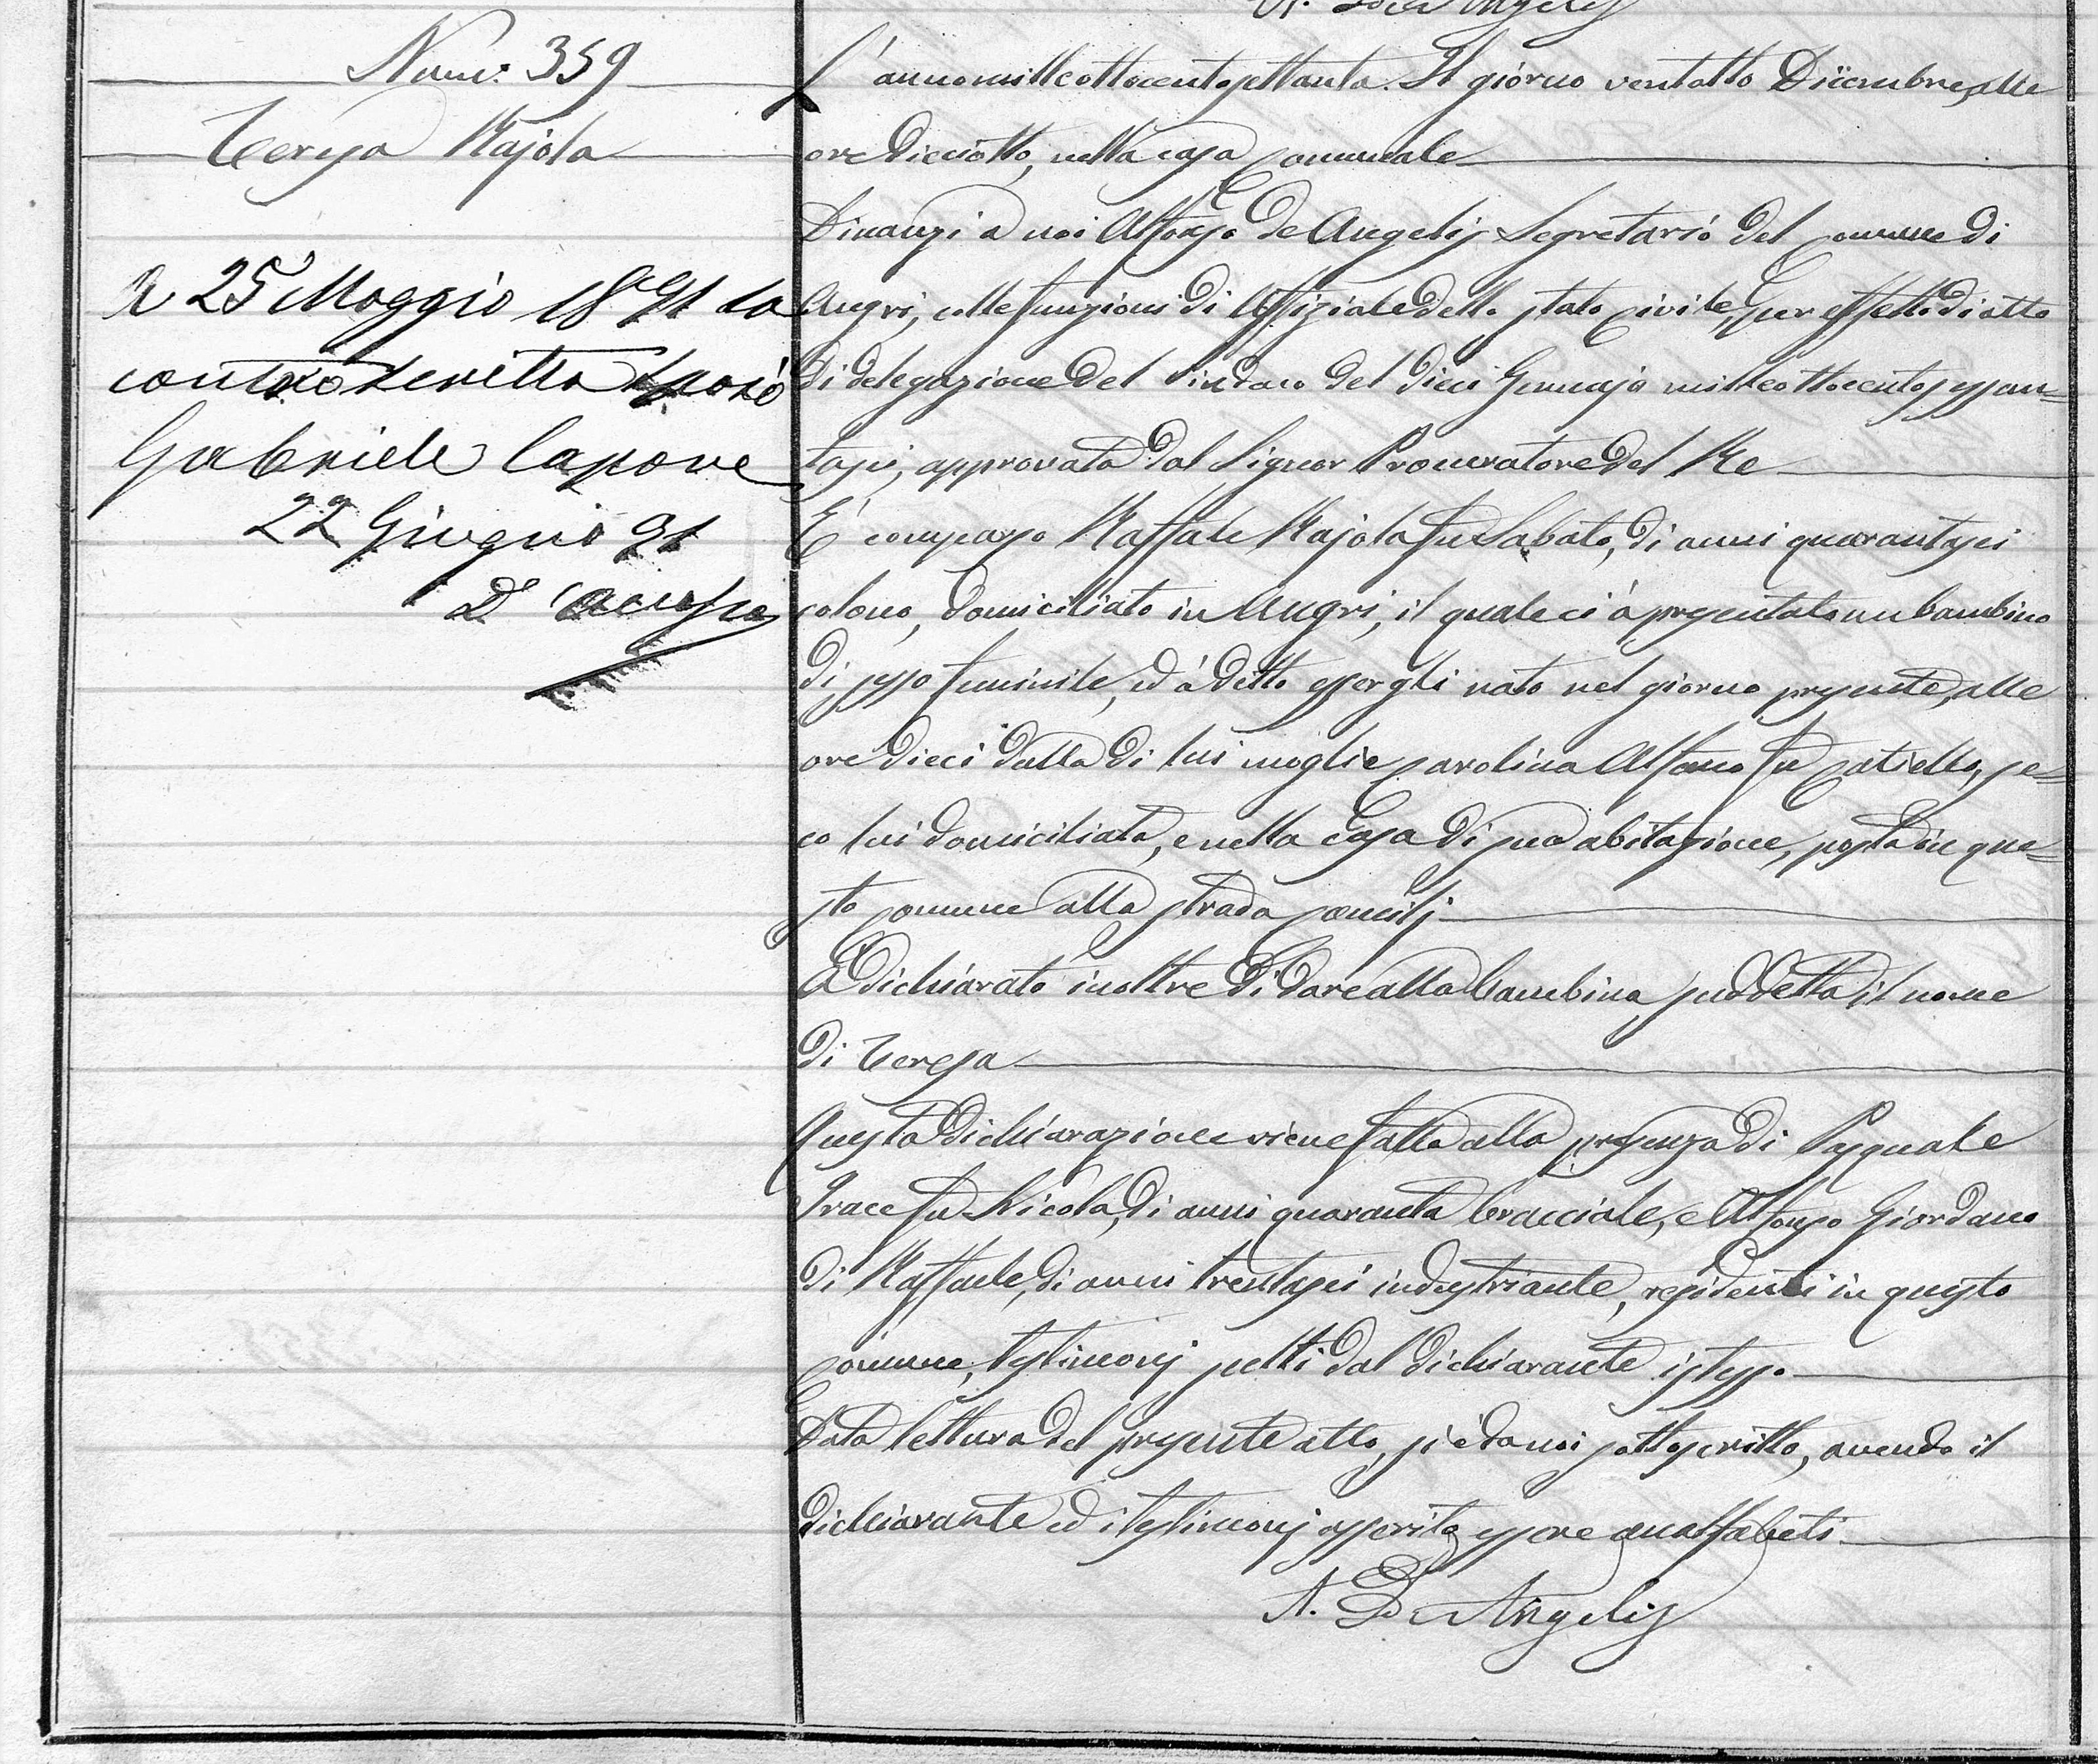 http://www.genealogiafamiliare.it/wp/wp-content/uploads/2018/03/Nascita-Madre-1.jpg